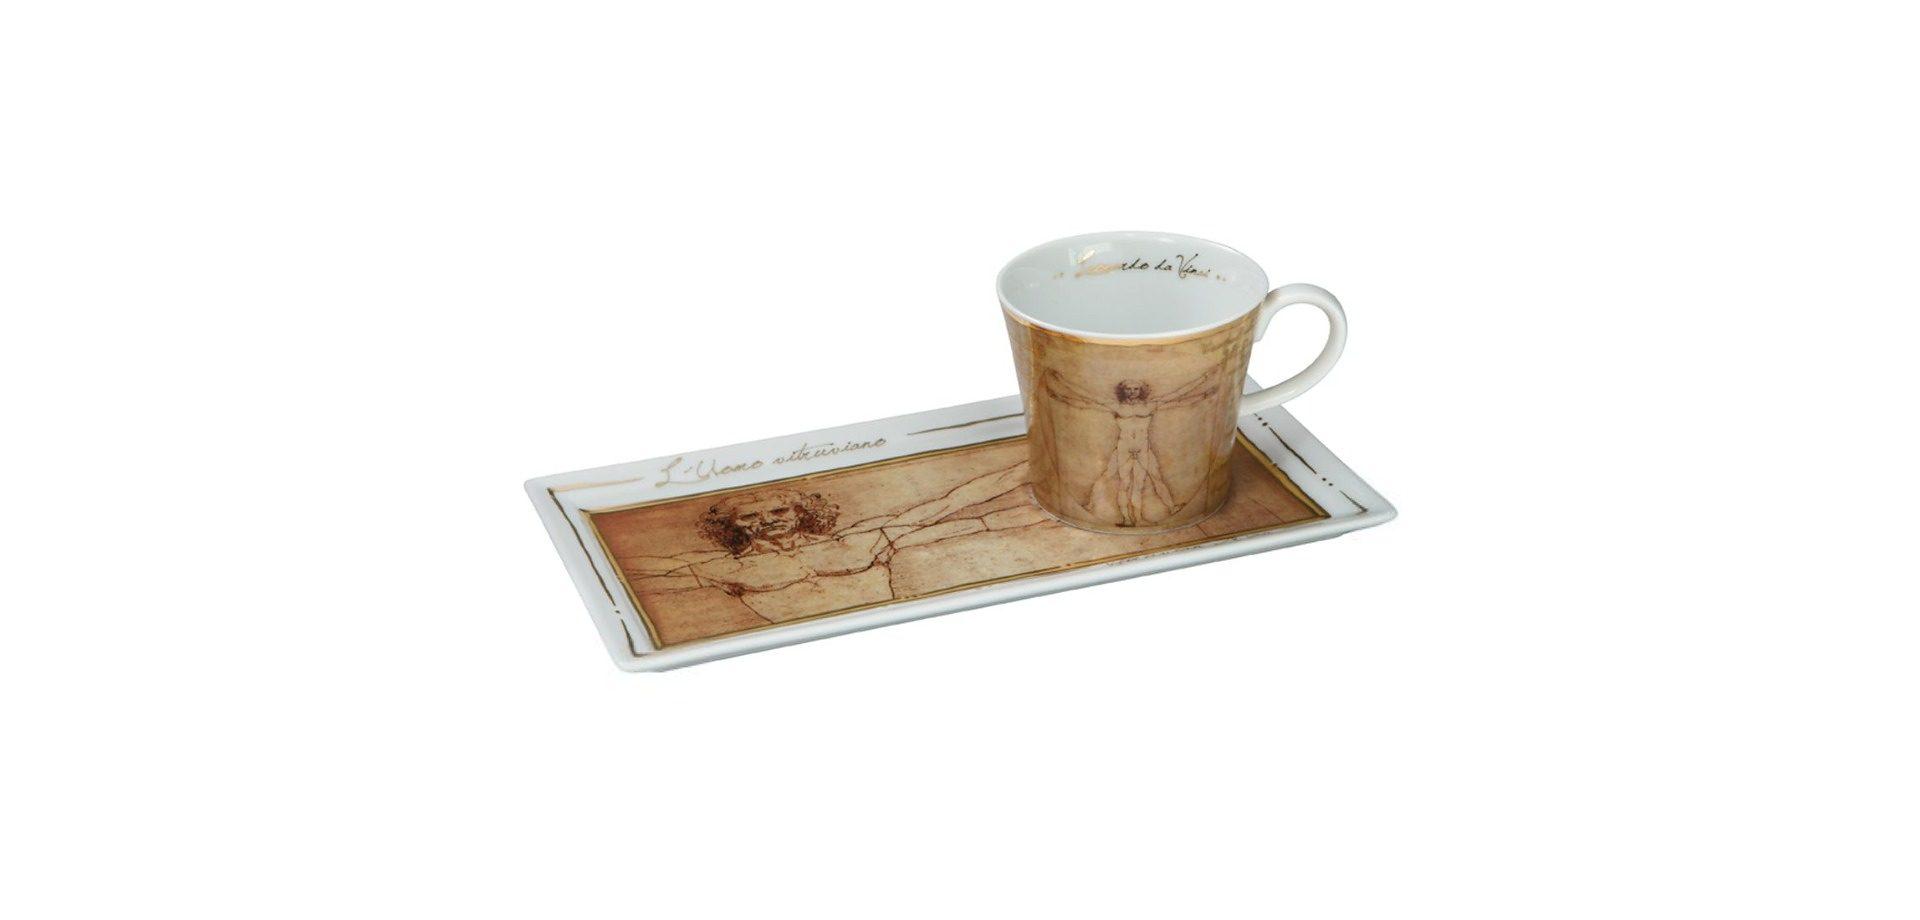 Goebel Kaffee-Set, Der vitruvianische Mensch 2-tlg. »Artis Orbis - Art & Coffee«